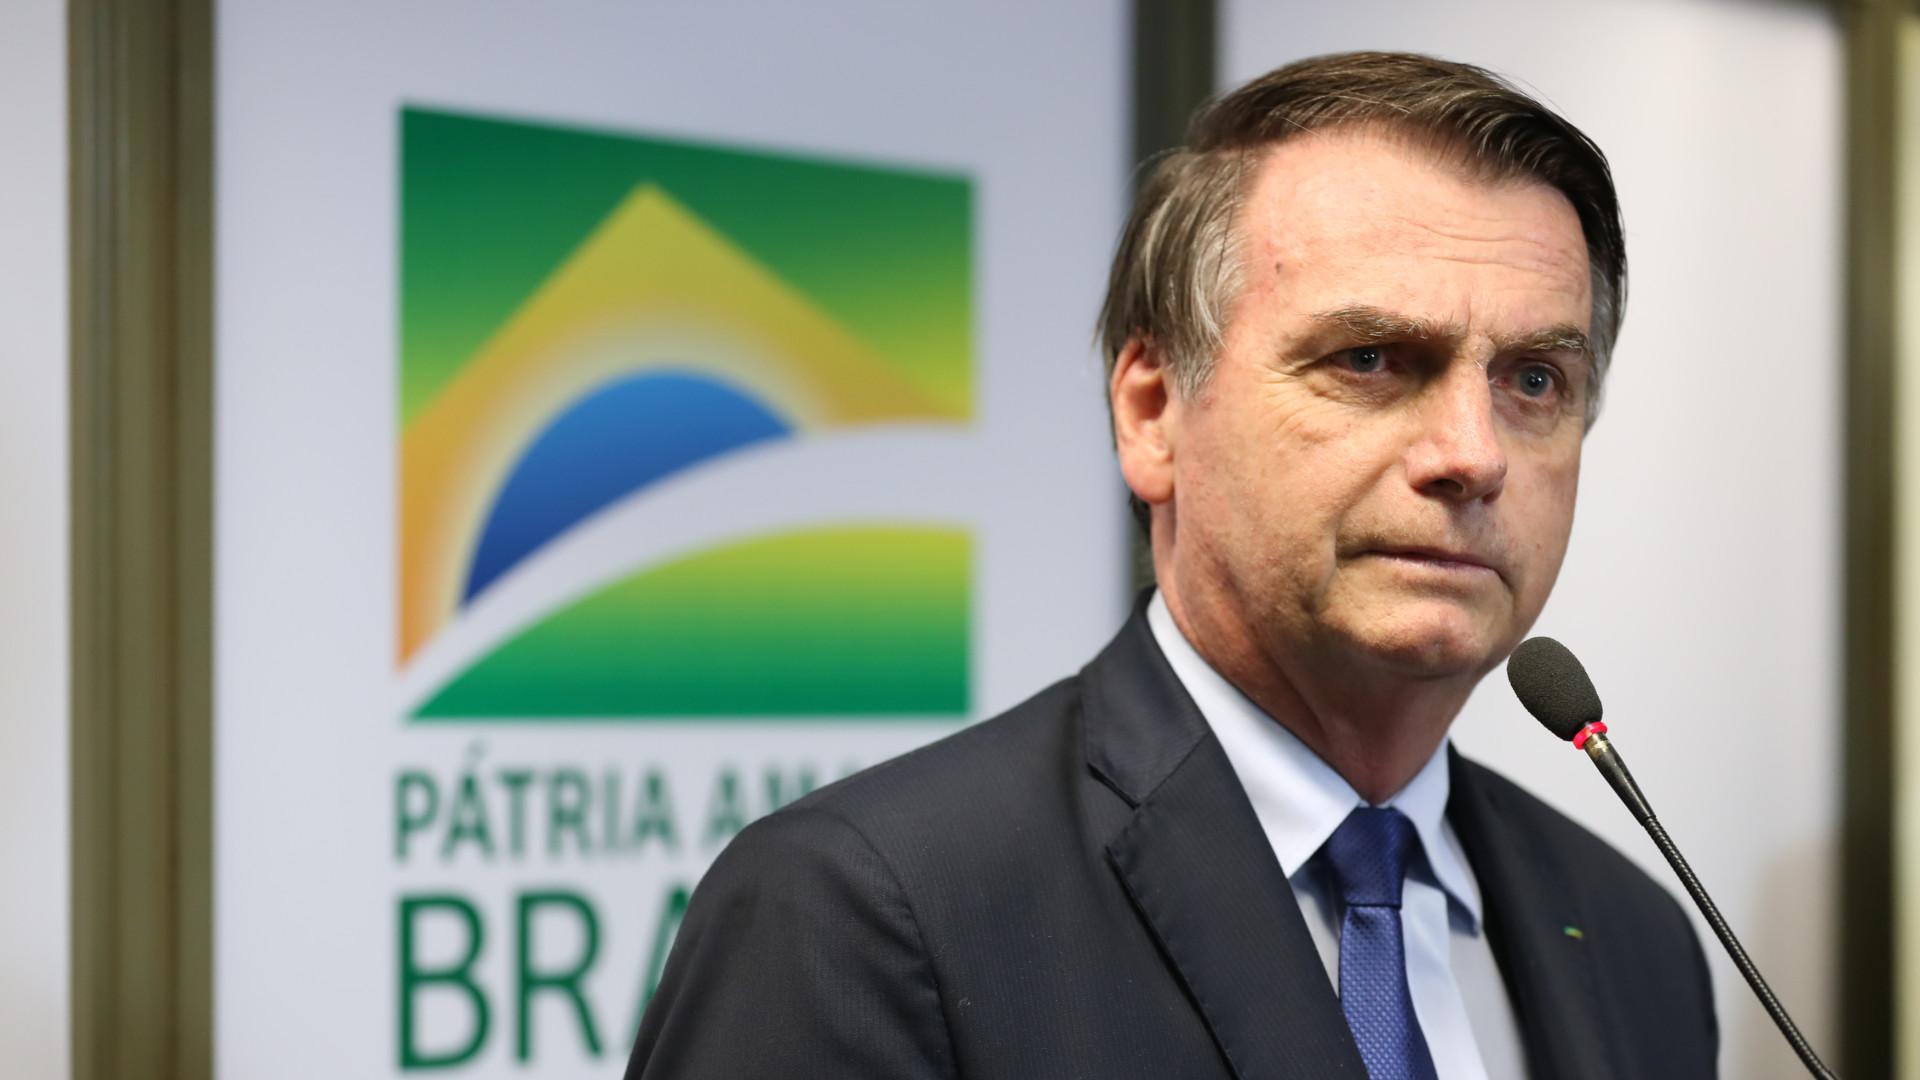 Relembre atos de Bolsonaro que causaram crise entre os Poderes